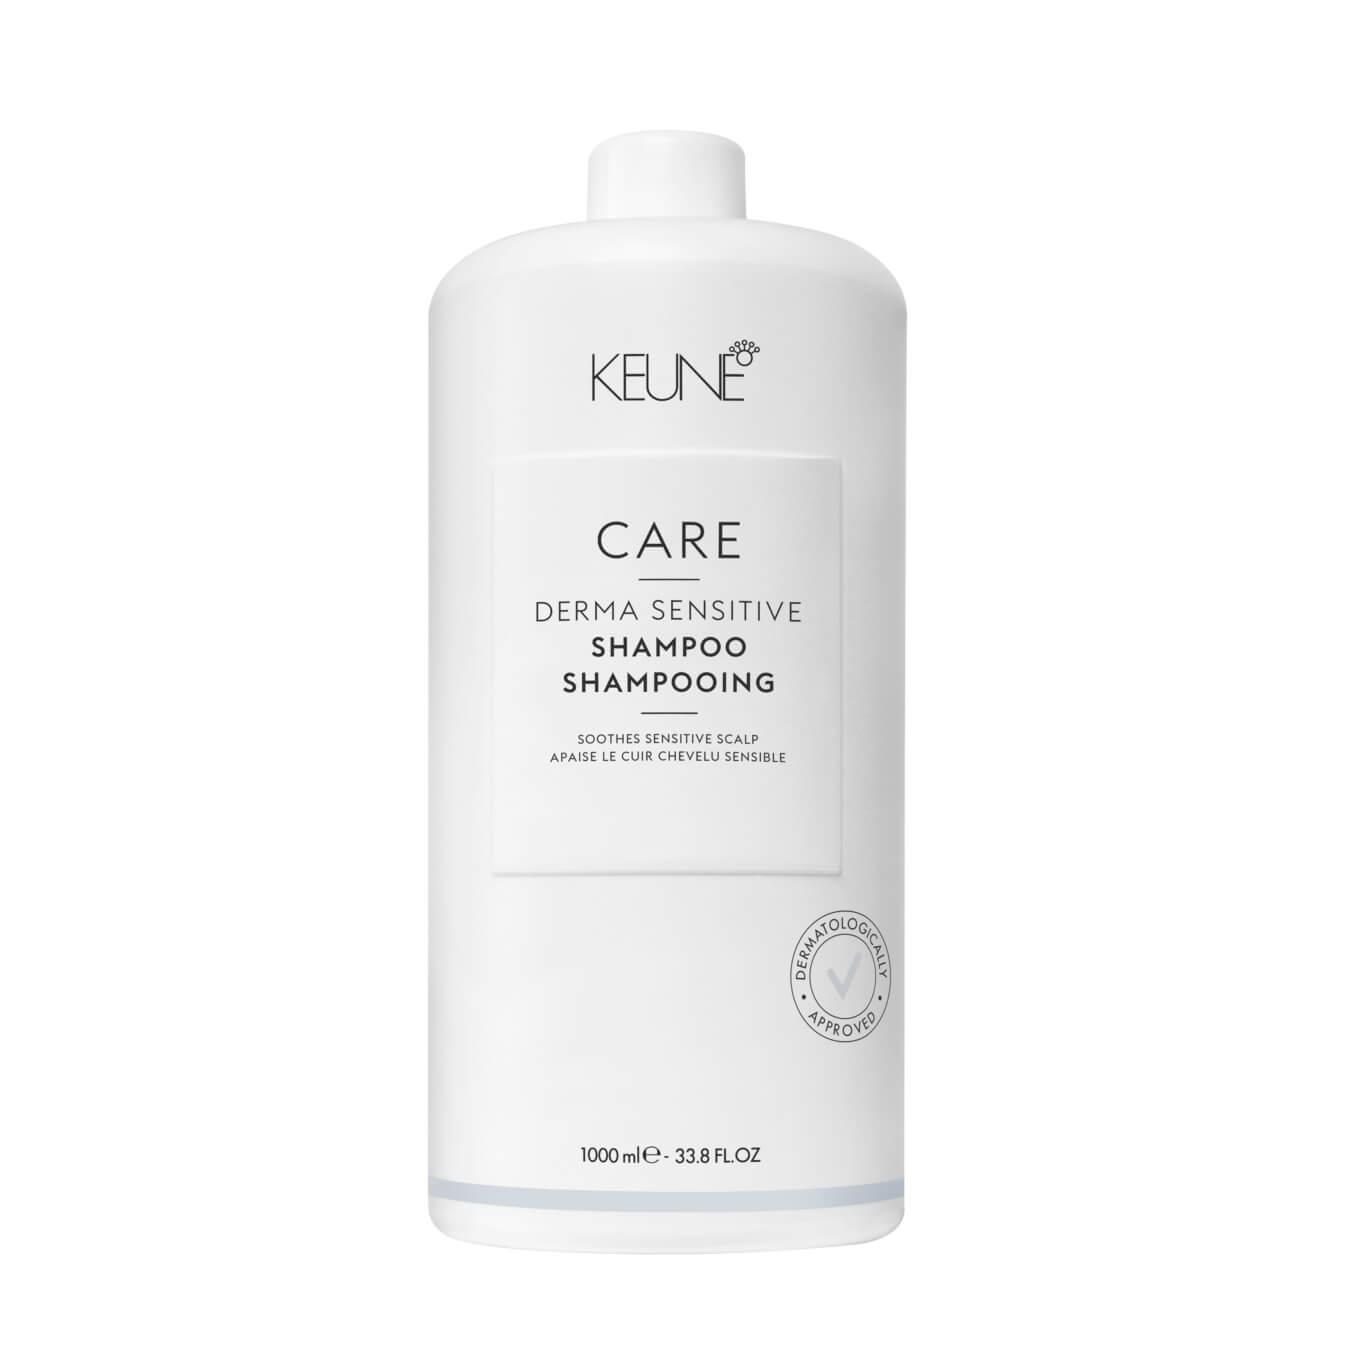 Kauf Keune Care Derma Sensitive Shampoo 1000ml